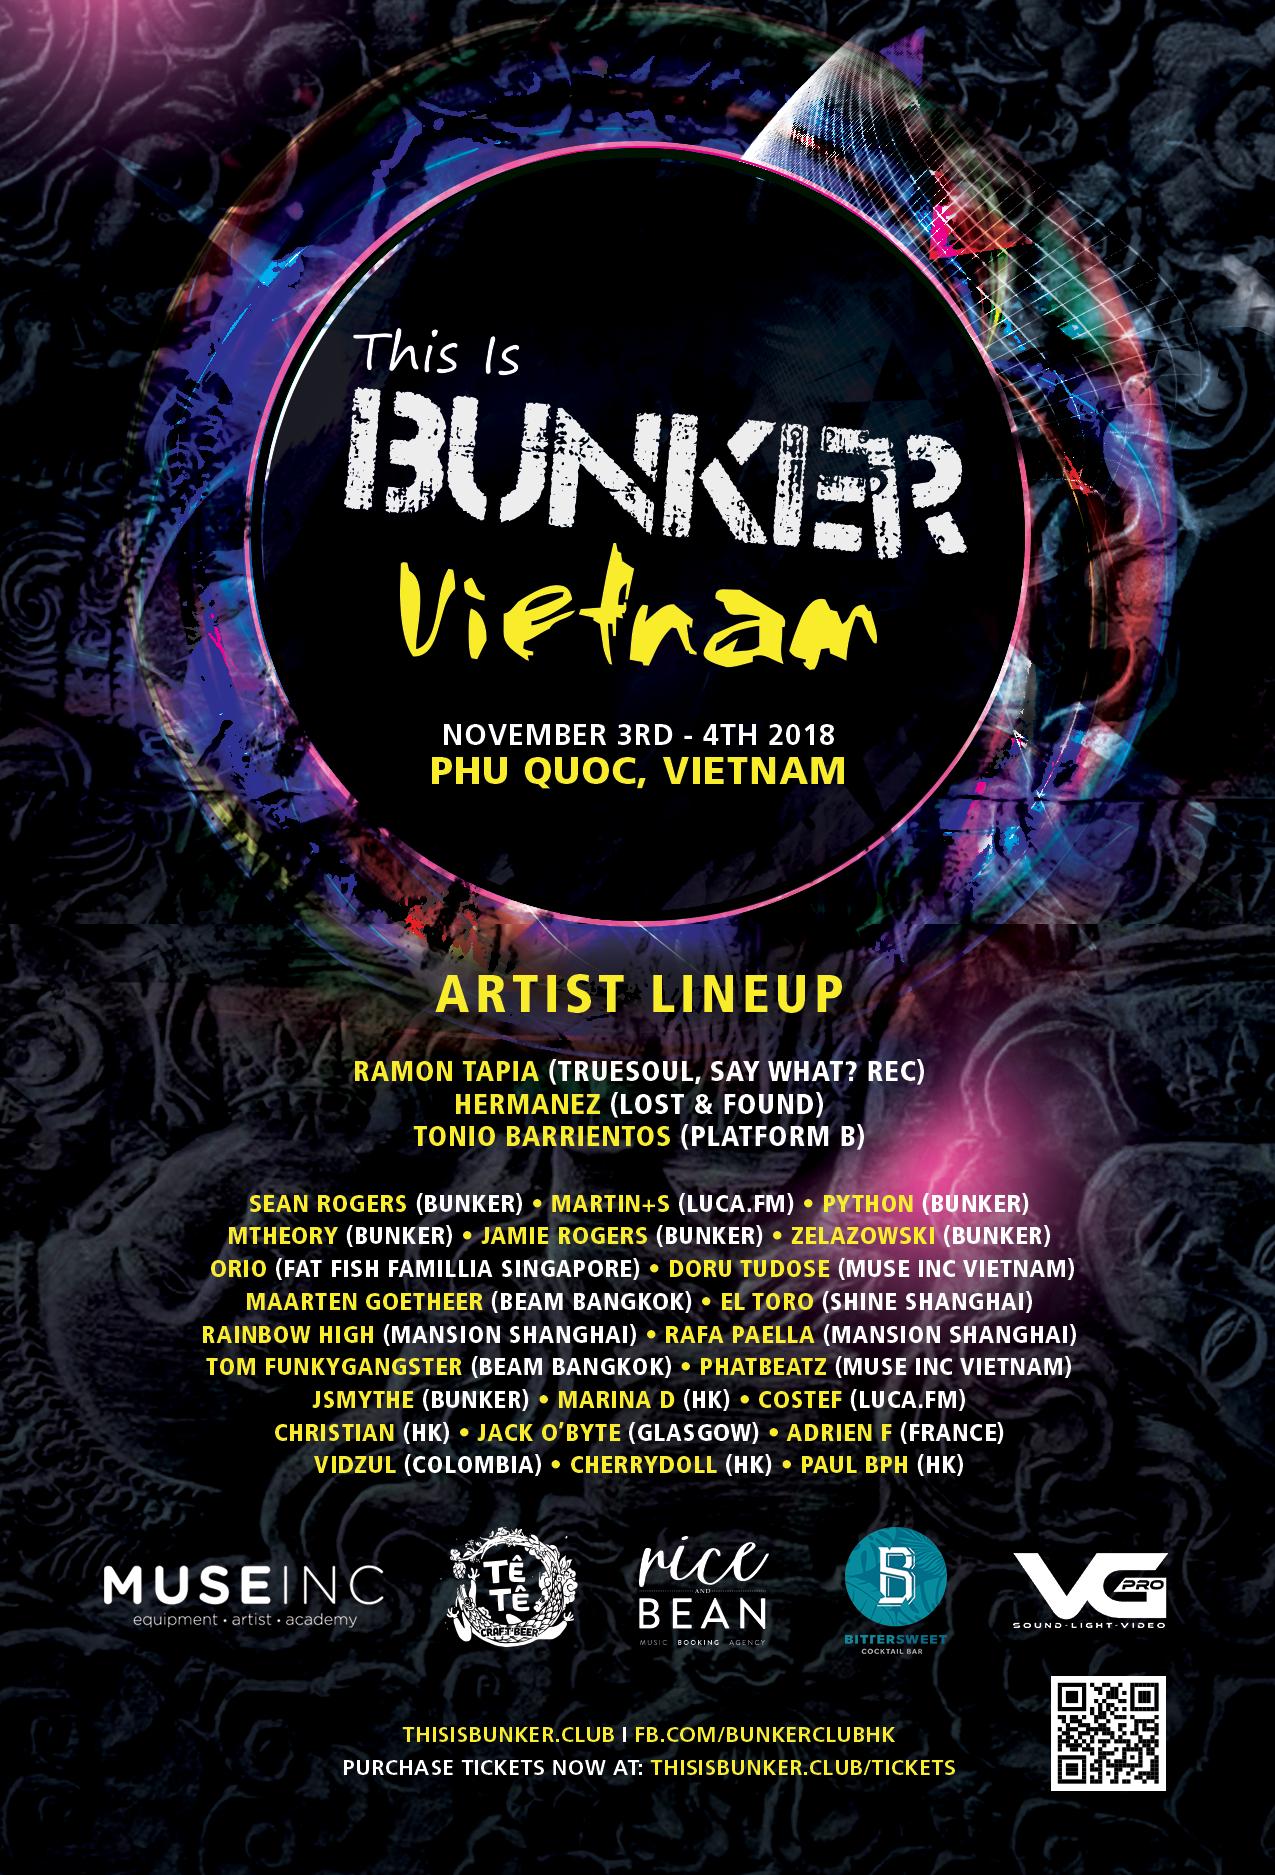 _Bunker-5-sponsors.png